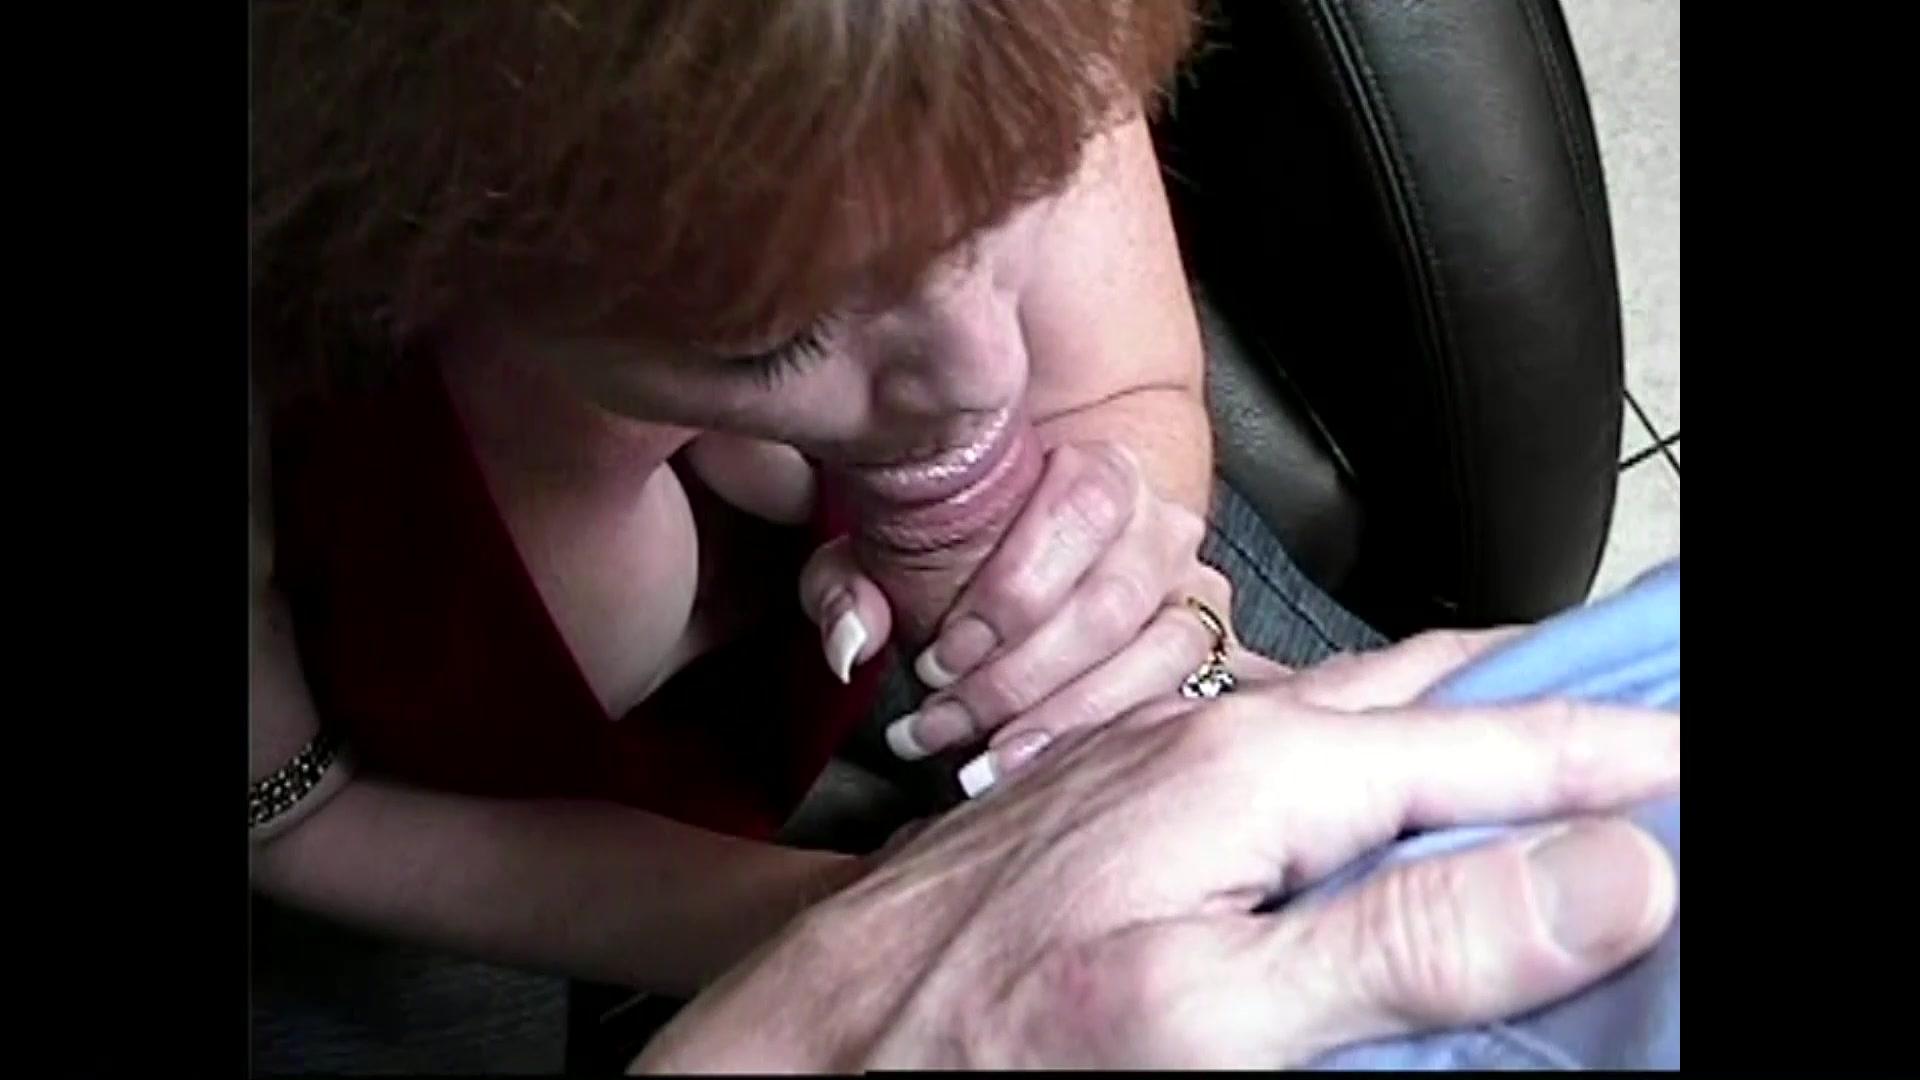 Give handjob dentist chair riding....Nice!!!!